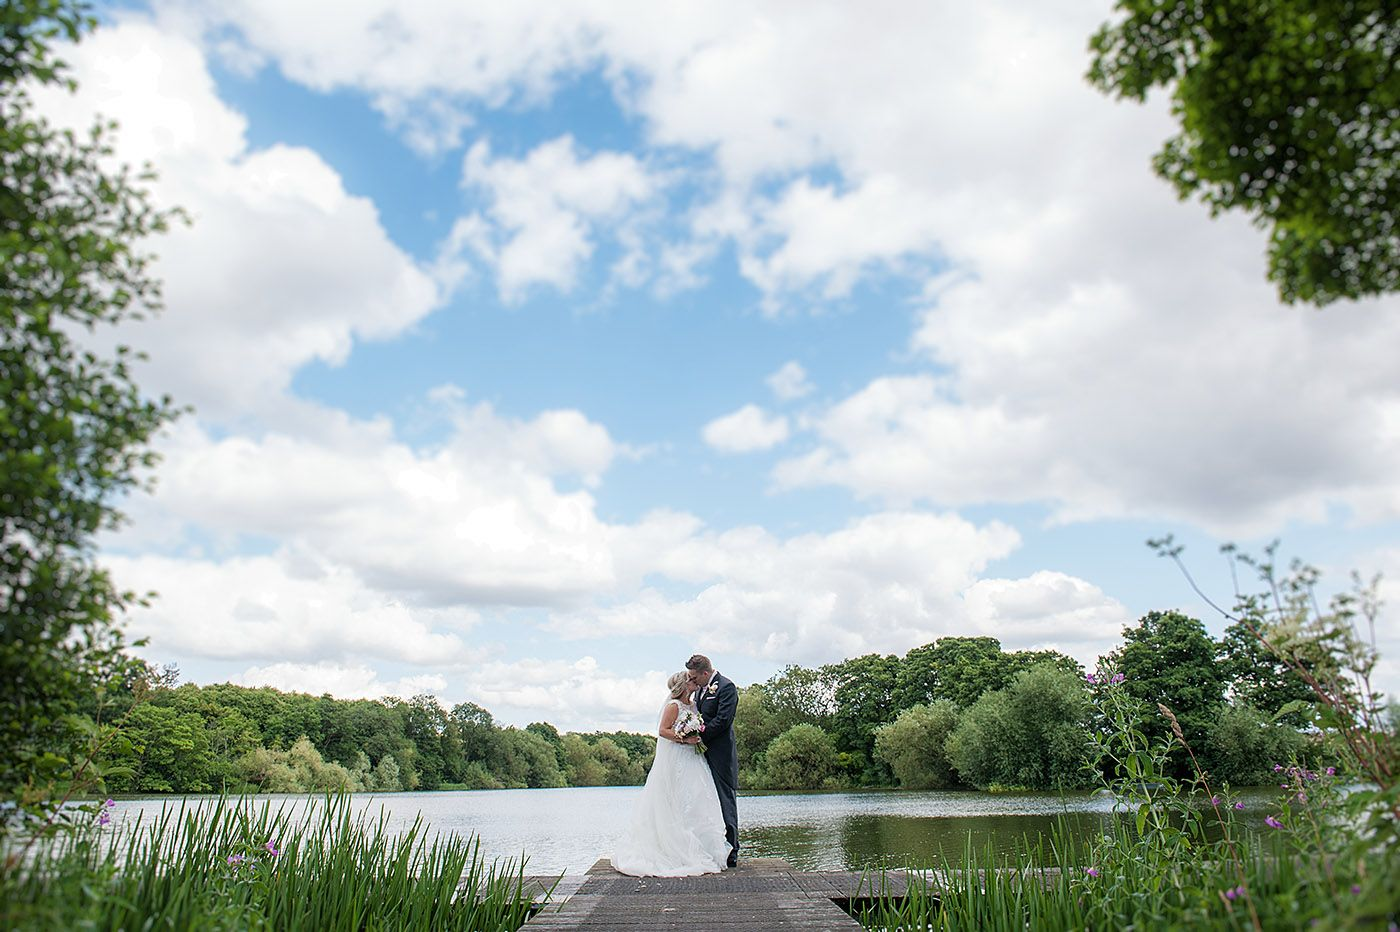 Civil Wedding Venue Wolverhamptontelford Patshull Park Wedding